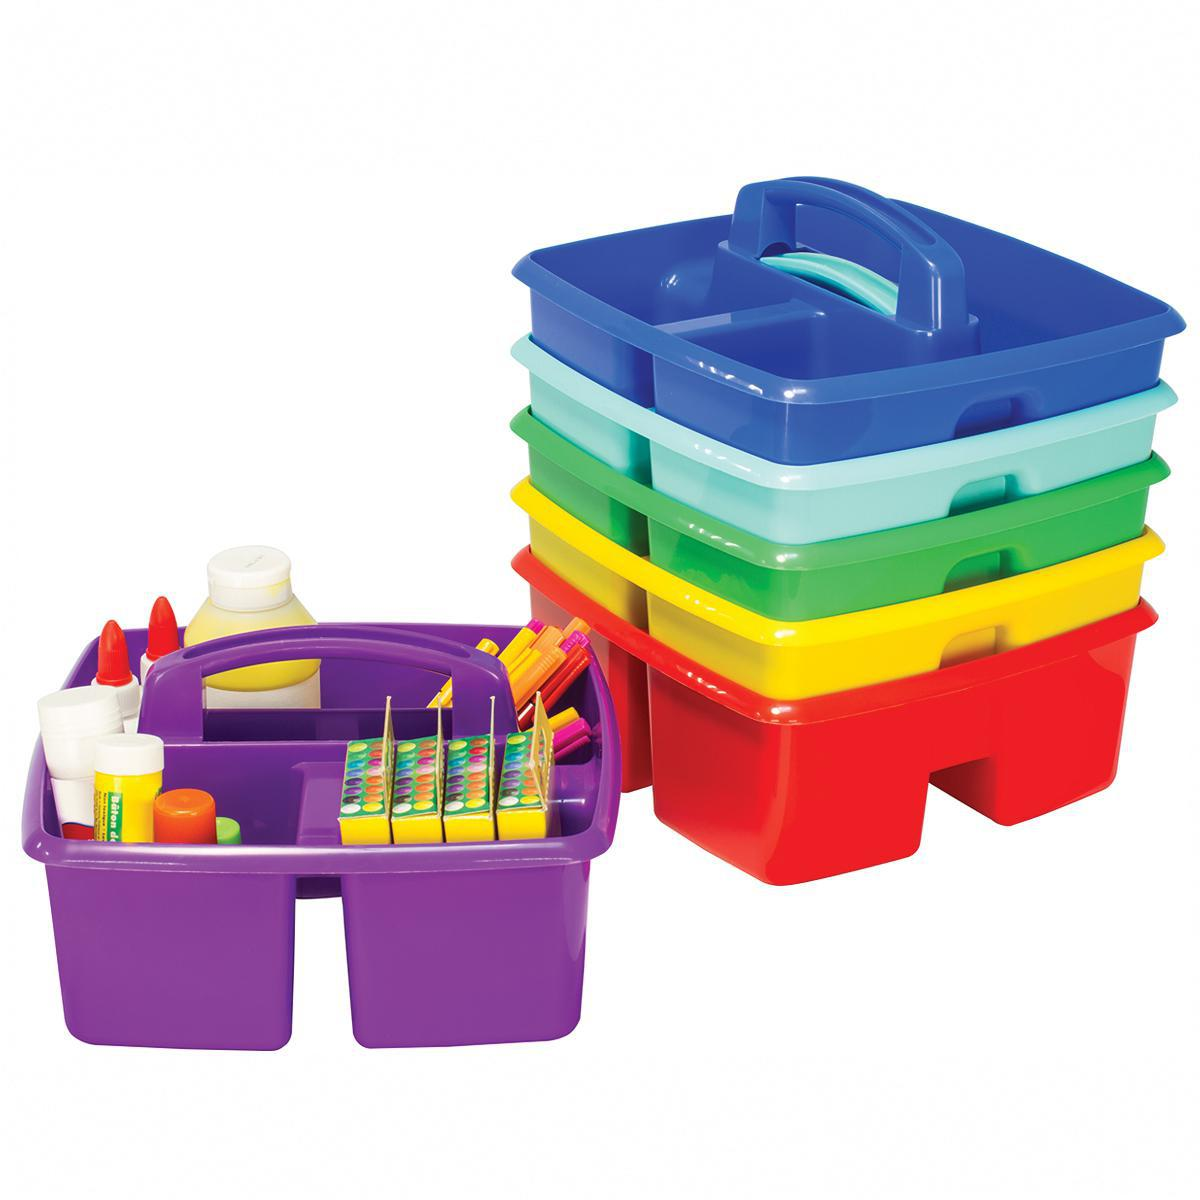 Classroom Caddies 6-Pack